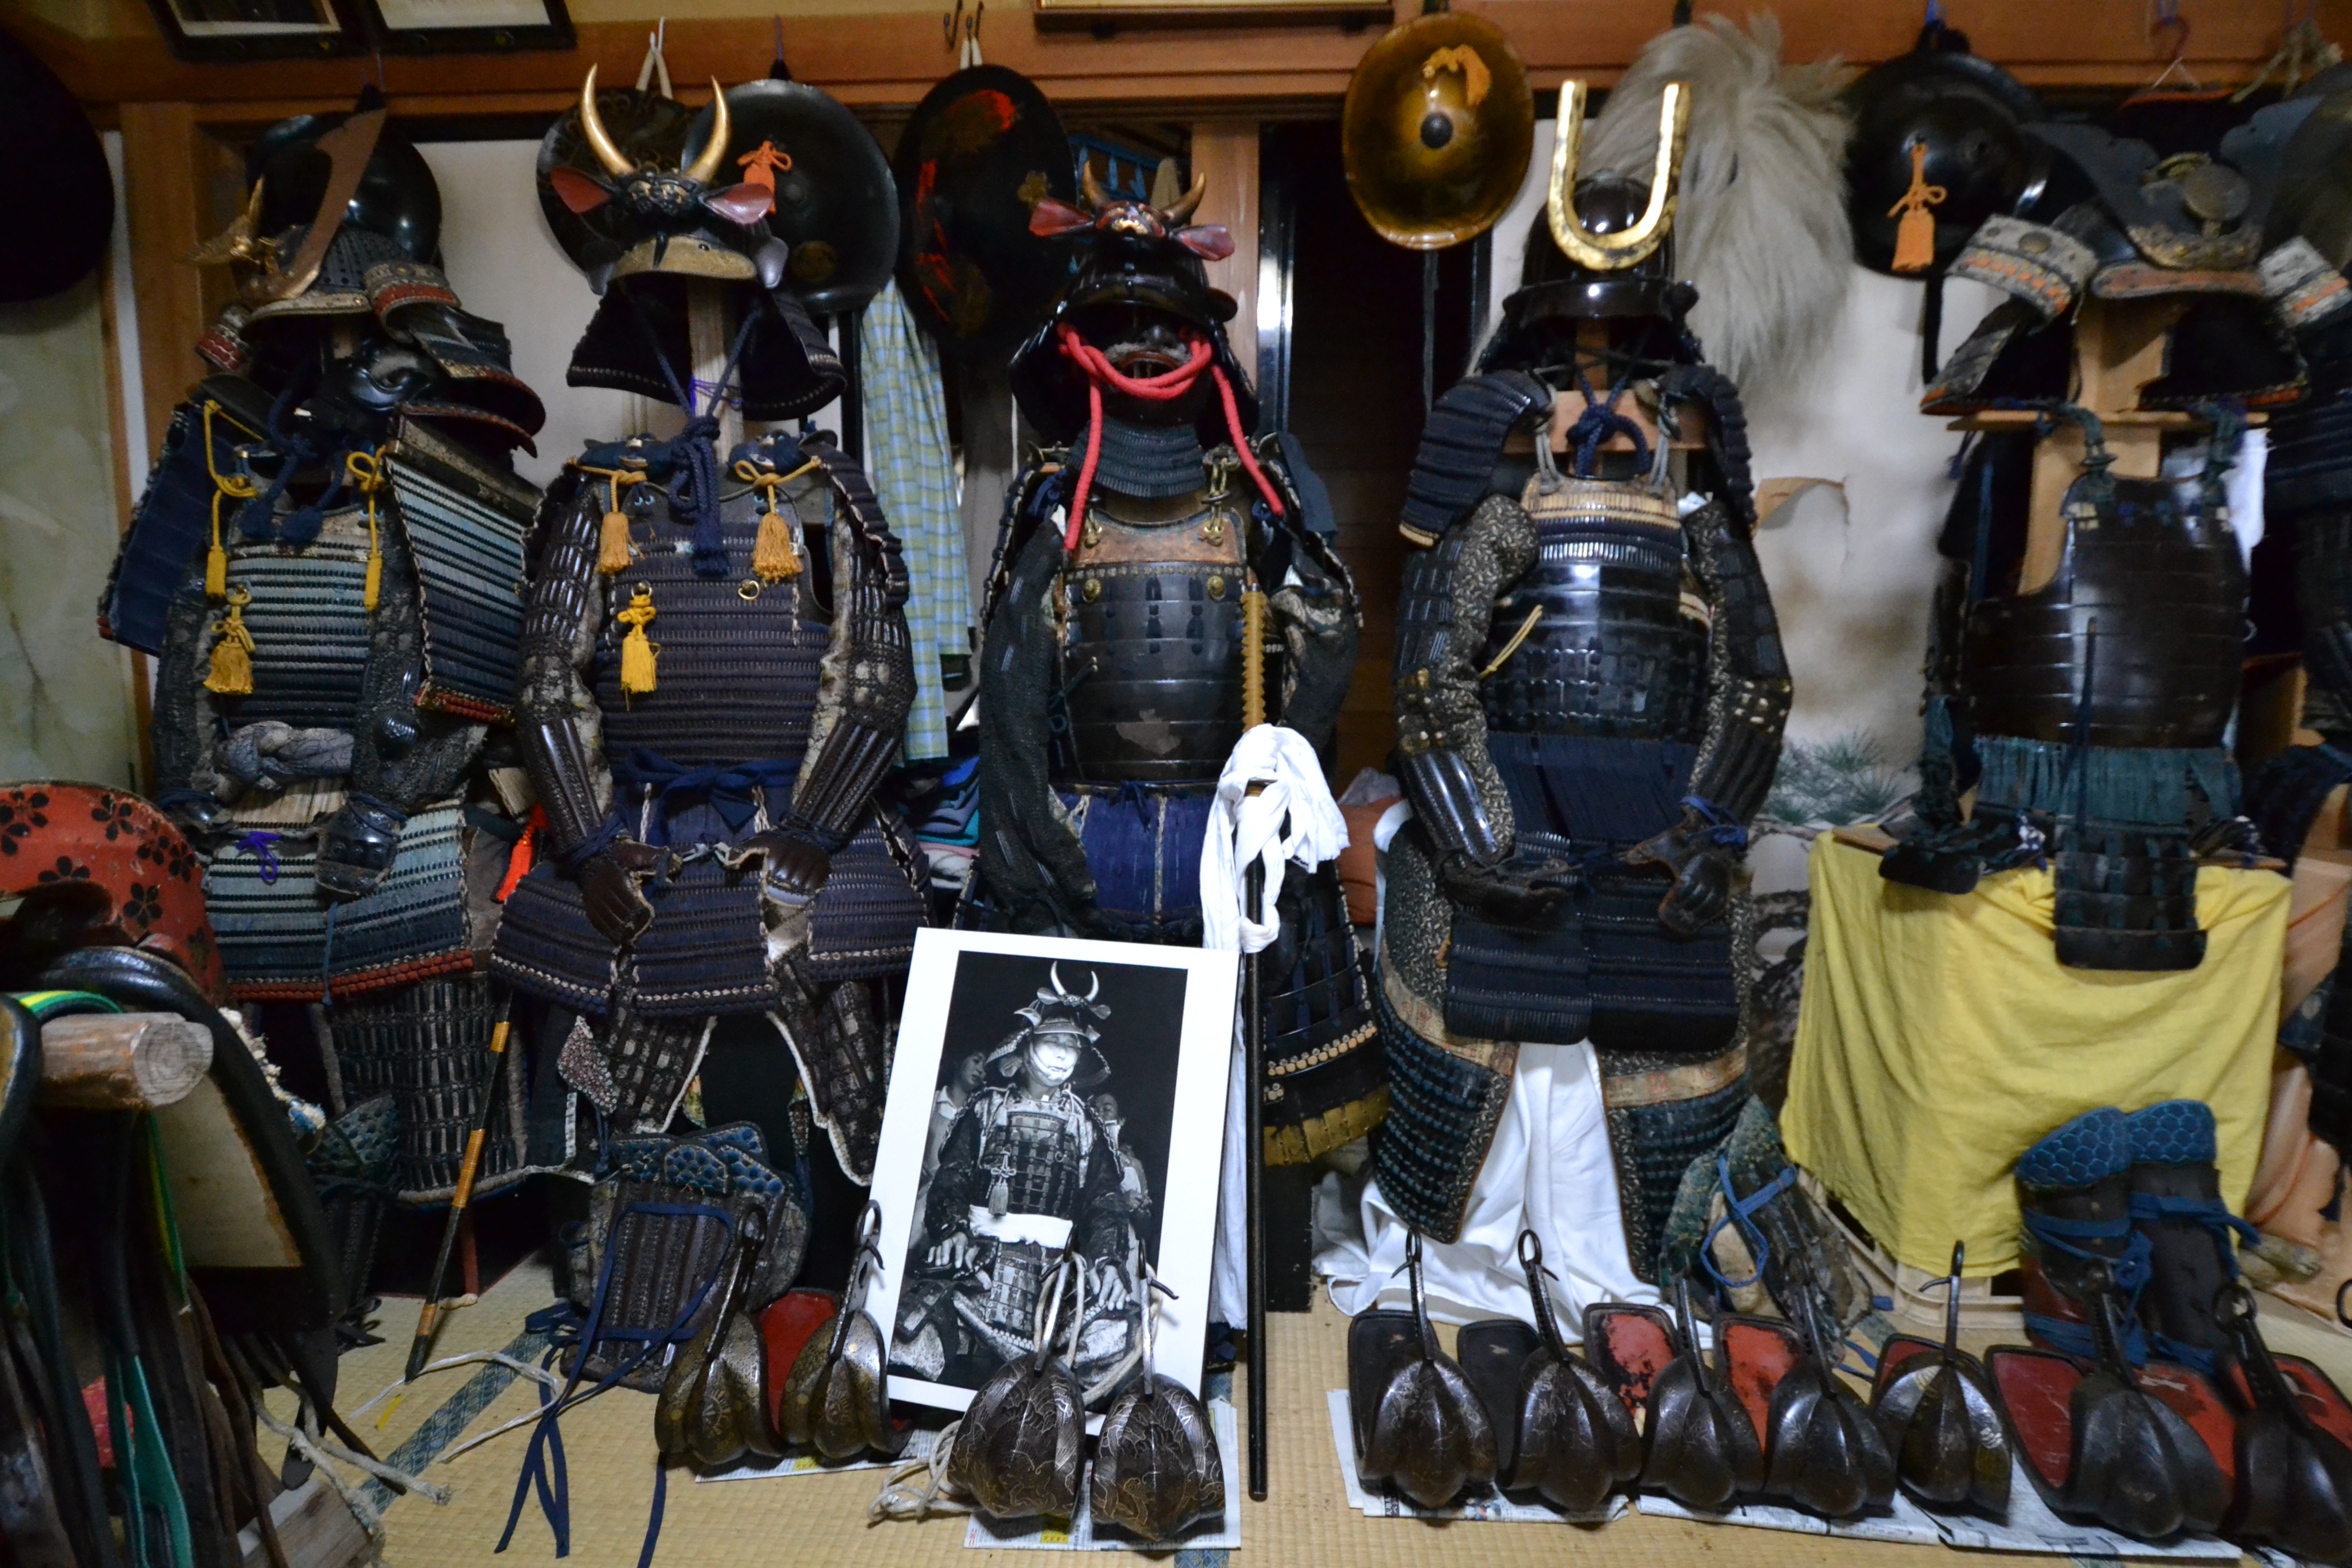 minamisoma samurai monma's armor lined up.JPG